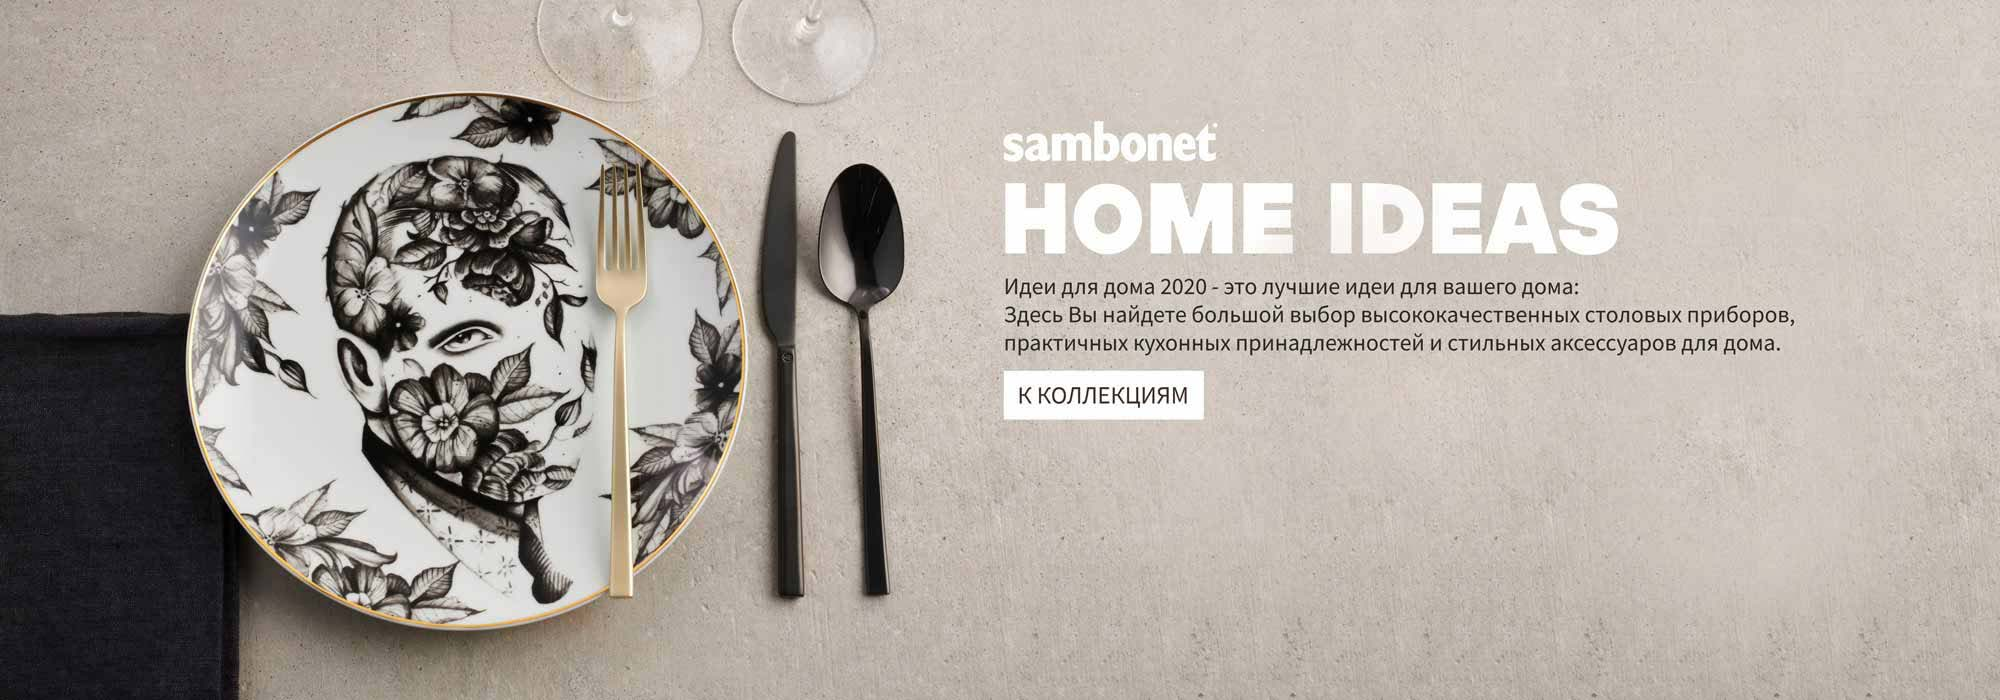 Home Ideas 2020